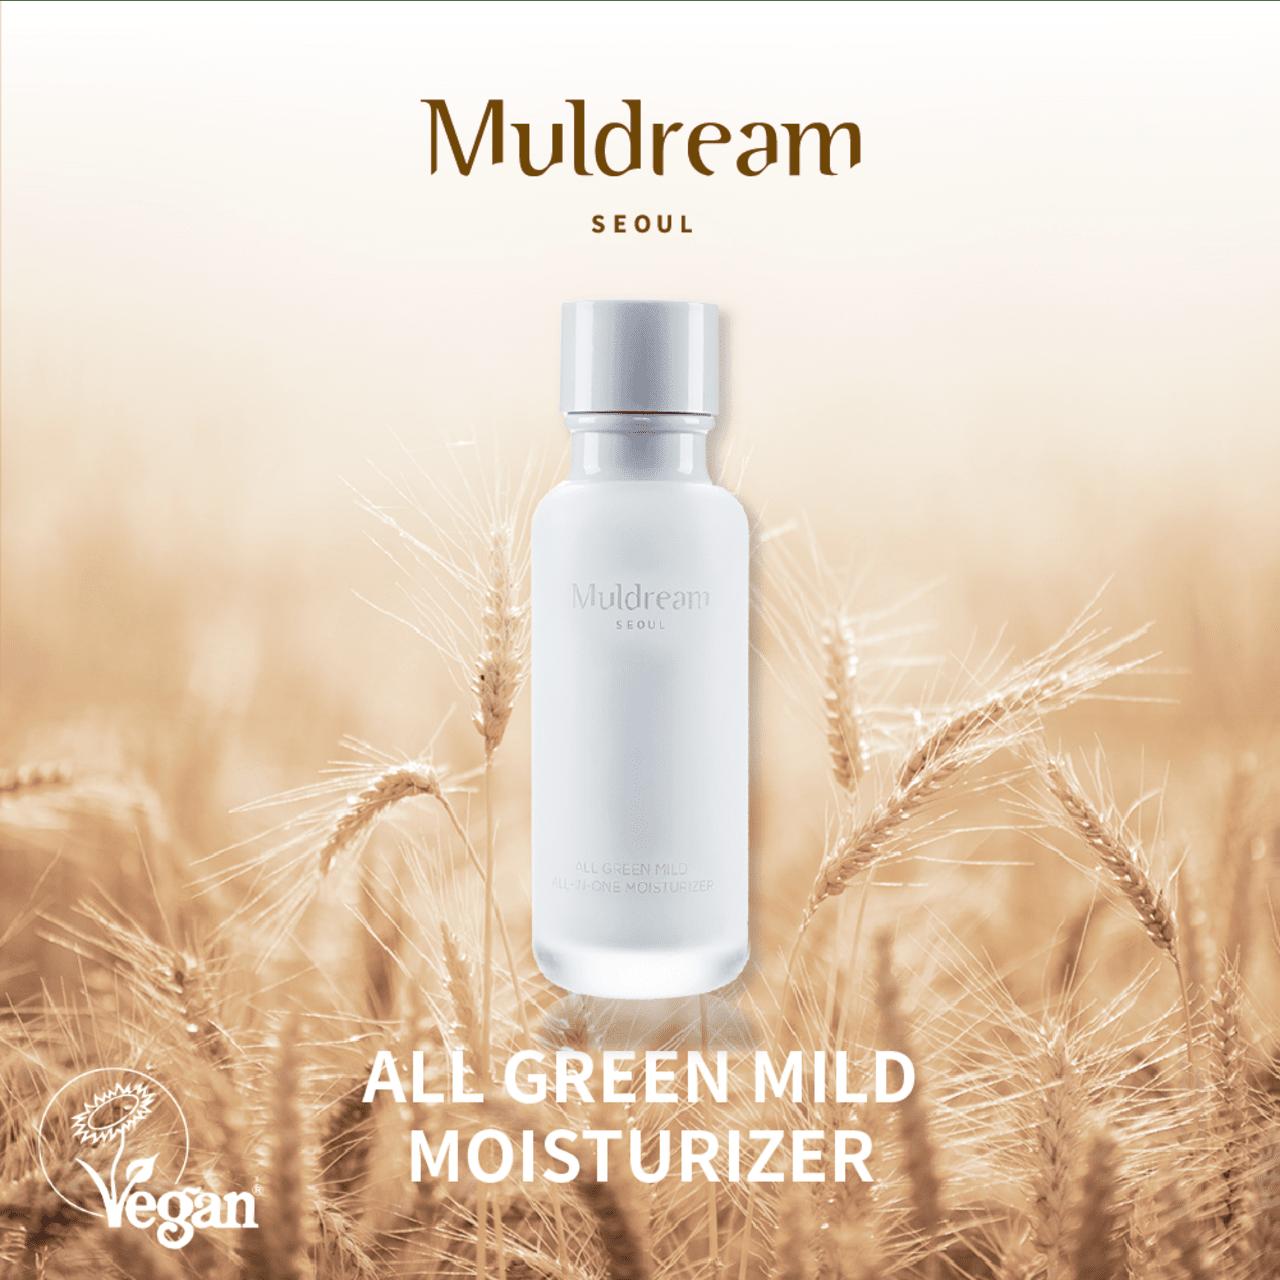 MULDREAM All Green Mild All In One Moisturizer, 110 ml